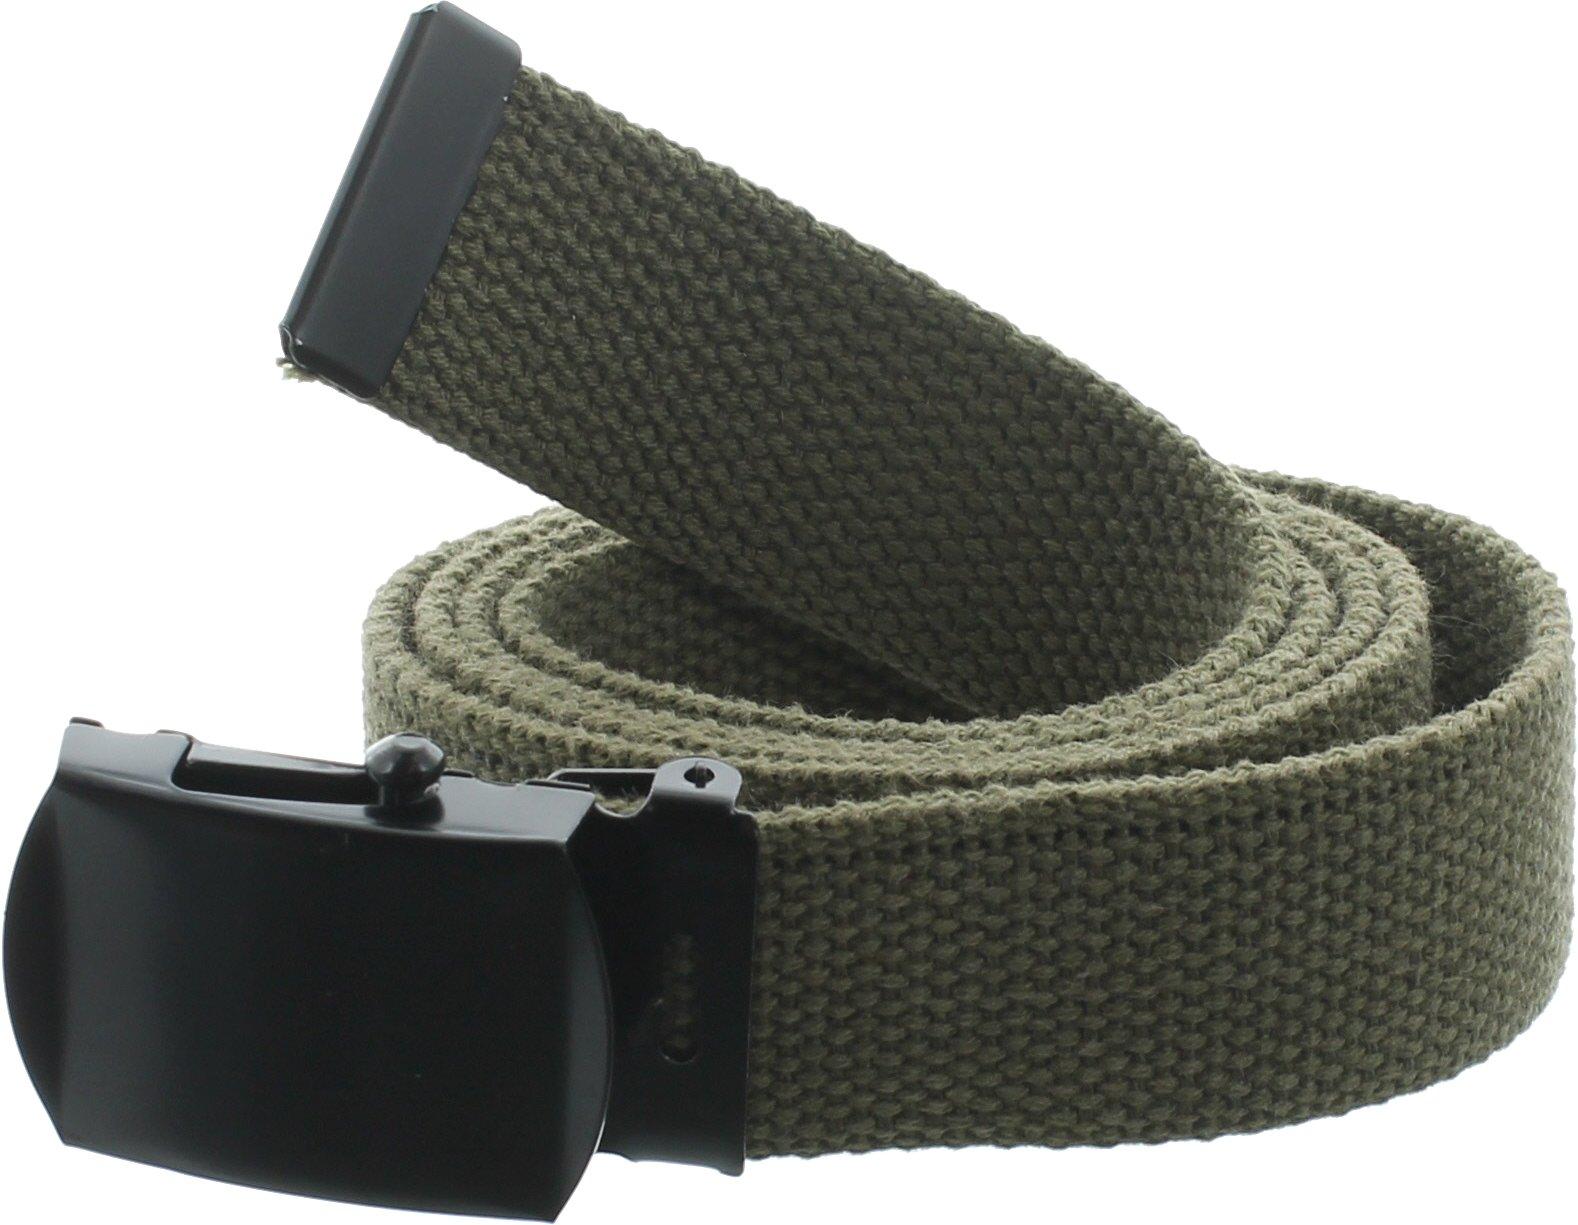 100% Cotton Military 54'' Web Belt (Olive Drab w/Black Buckle)